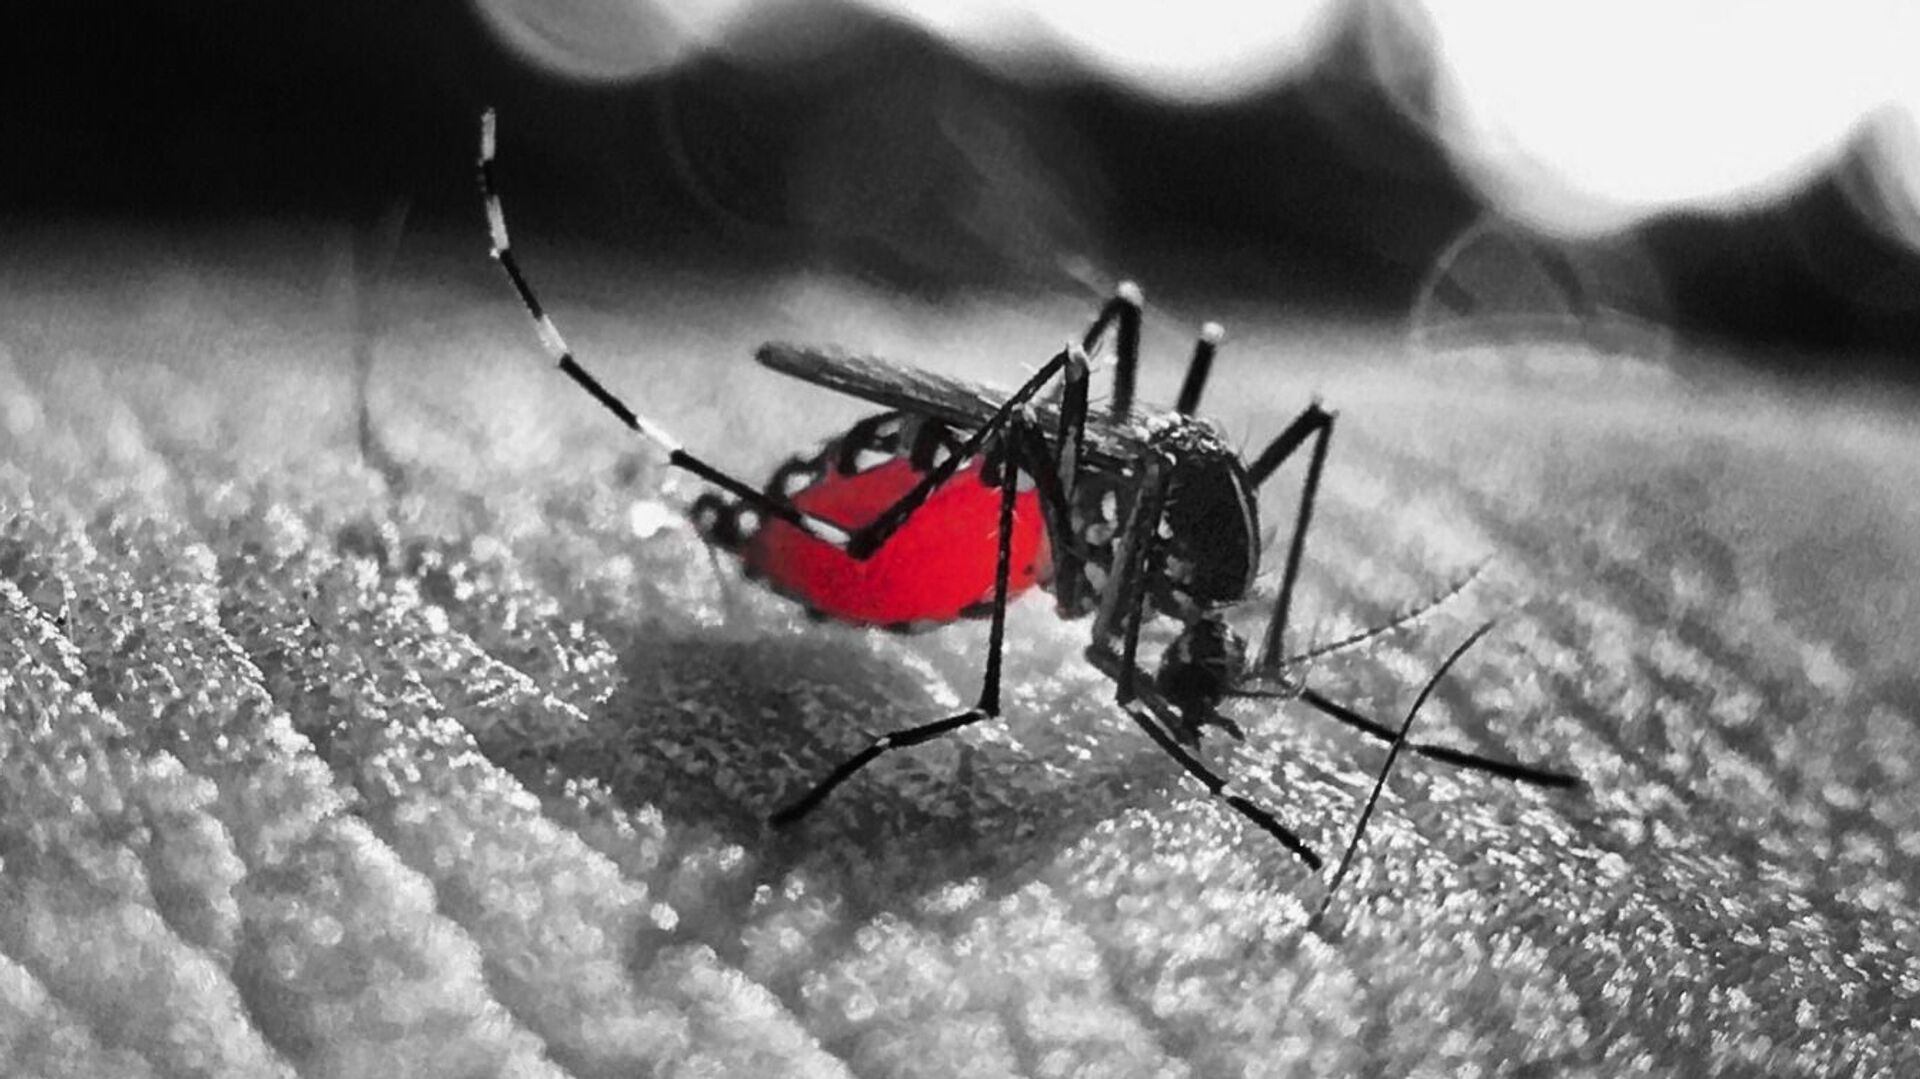 Un mosquito (imagen referencial) - Sputnik Mundo, 1920, 12.08.2021